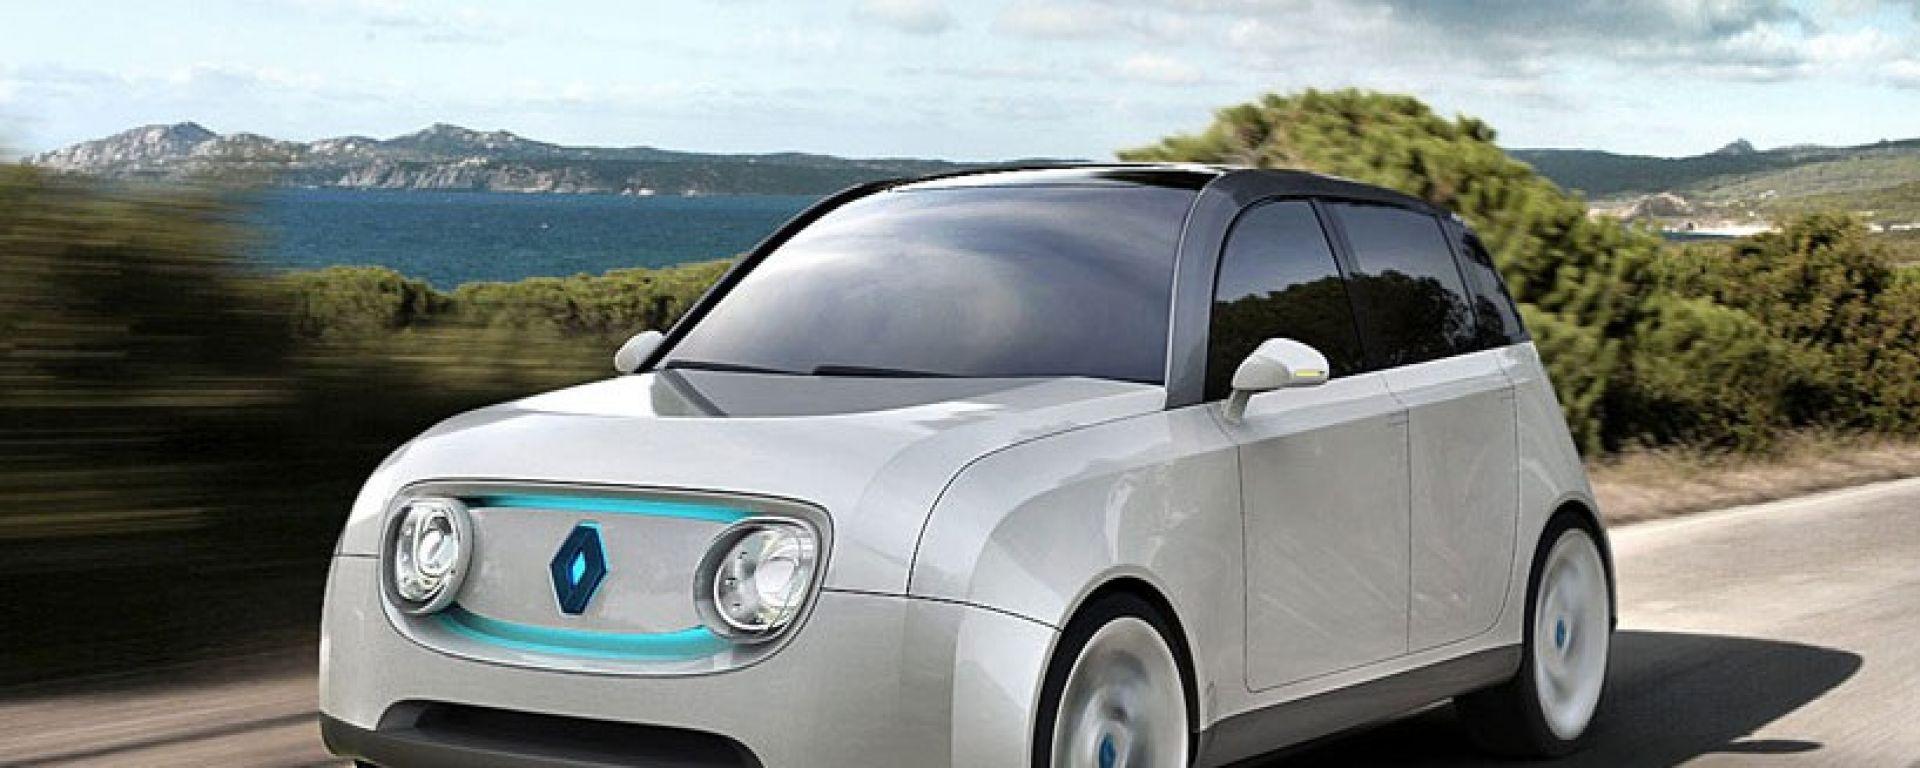 Renault 4Lectric